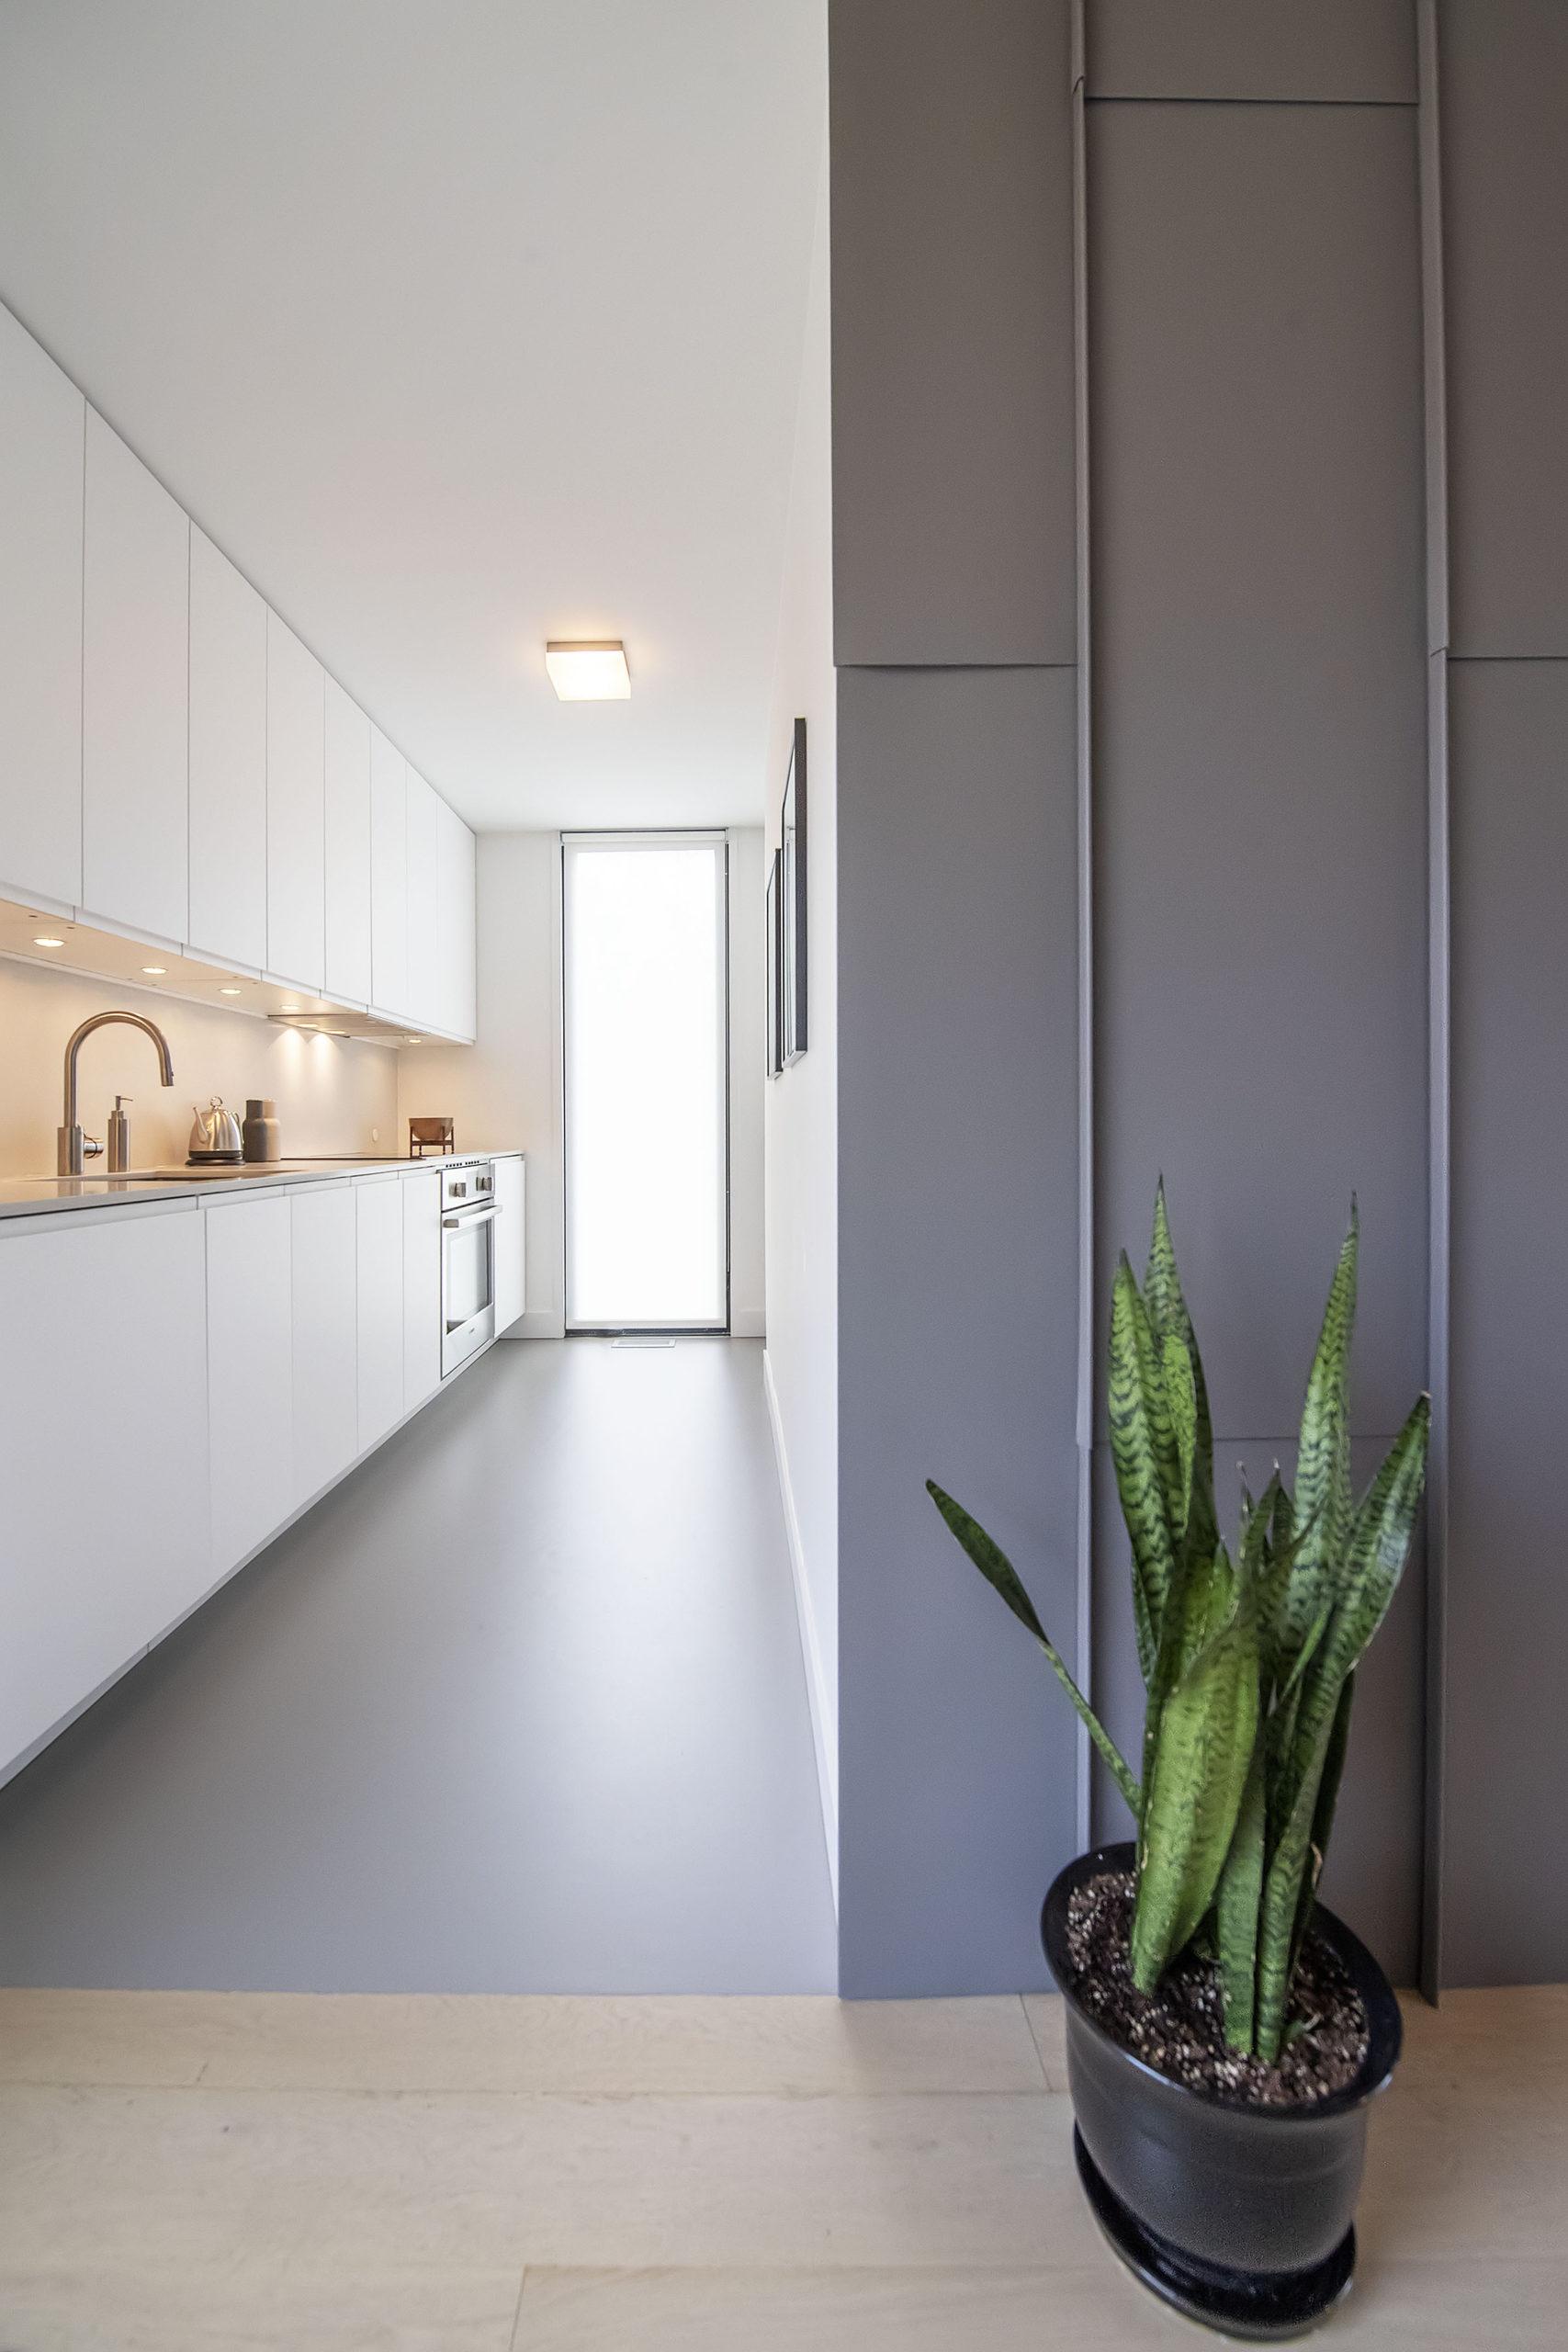 The Milestone kitchen.